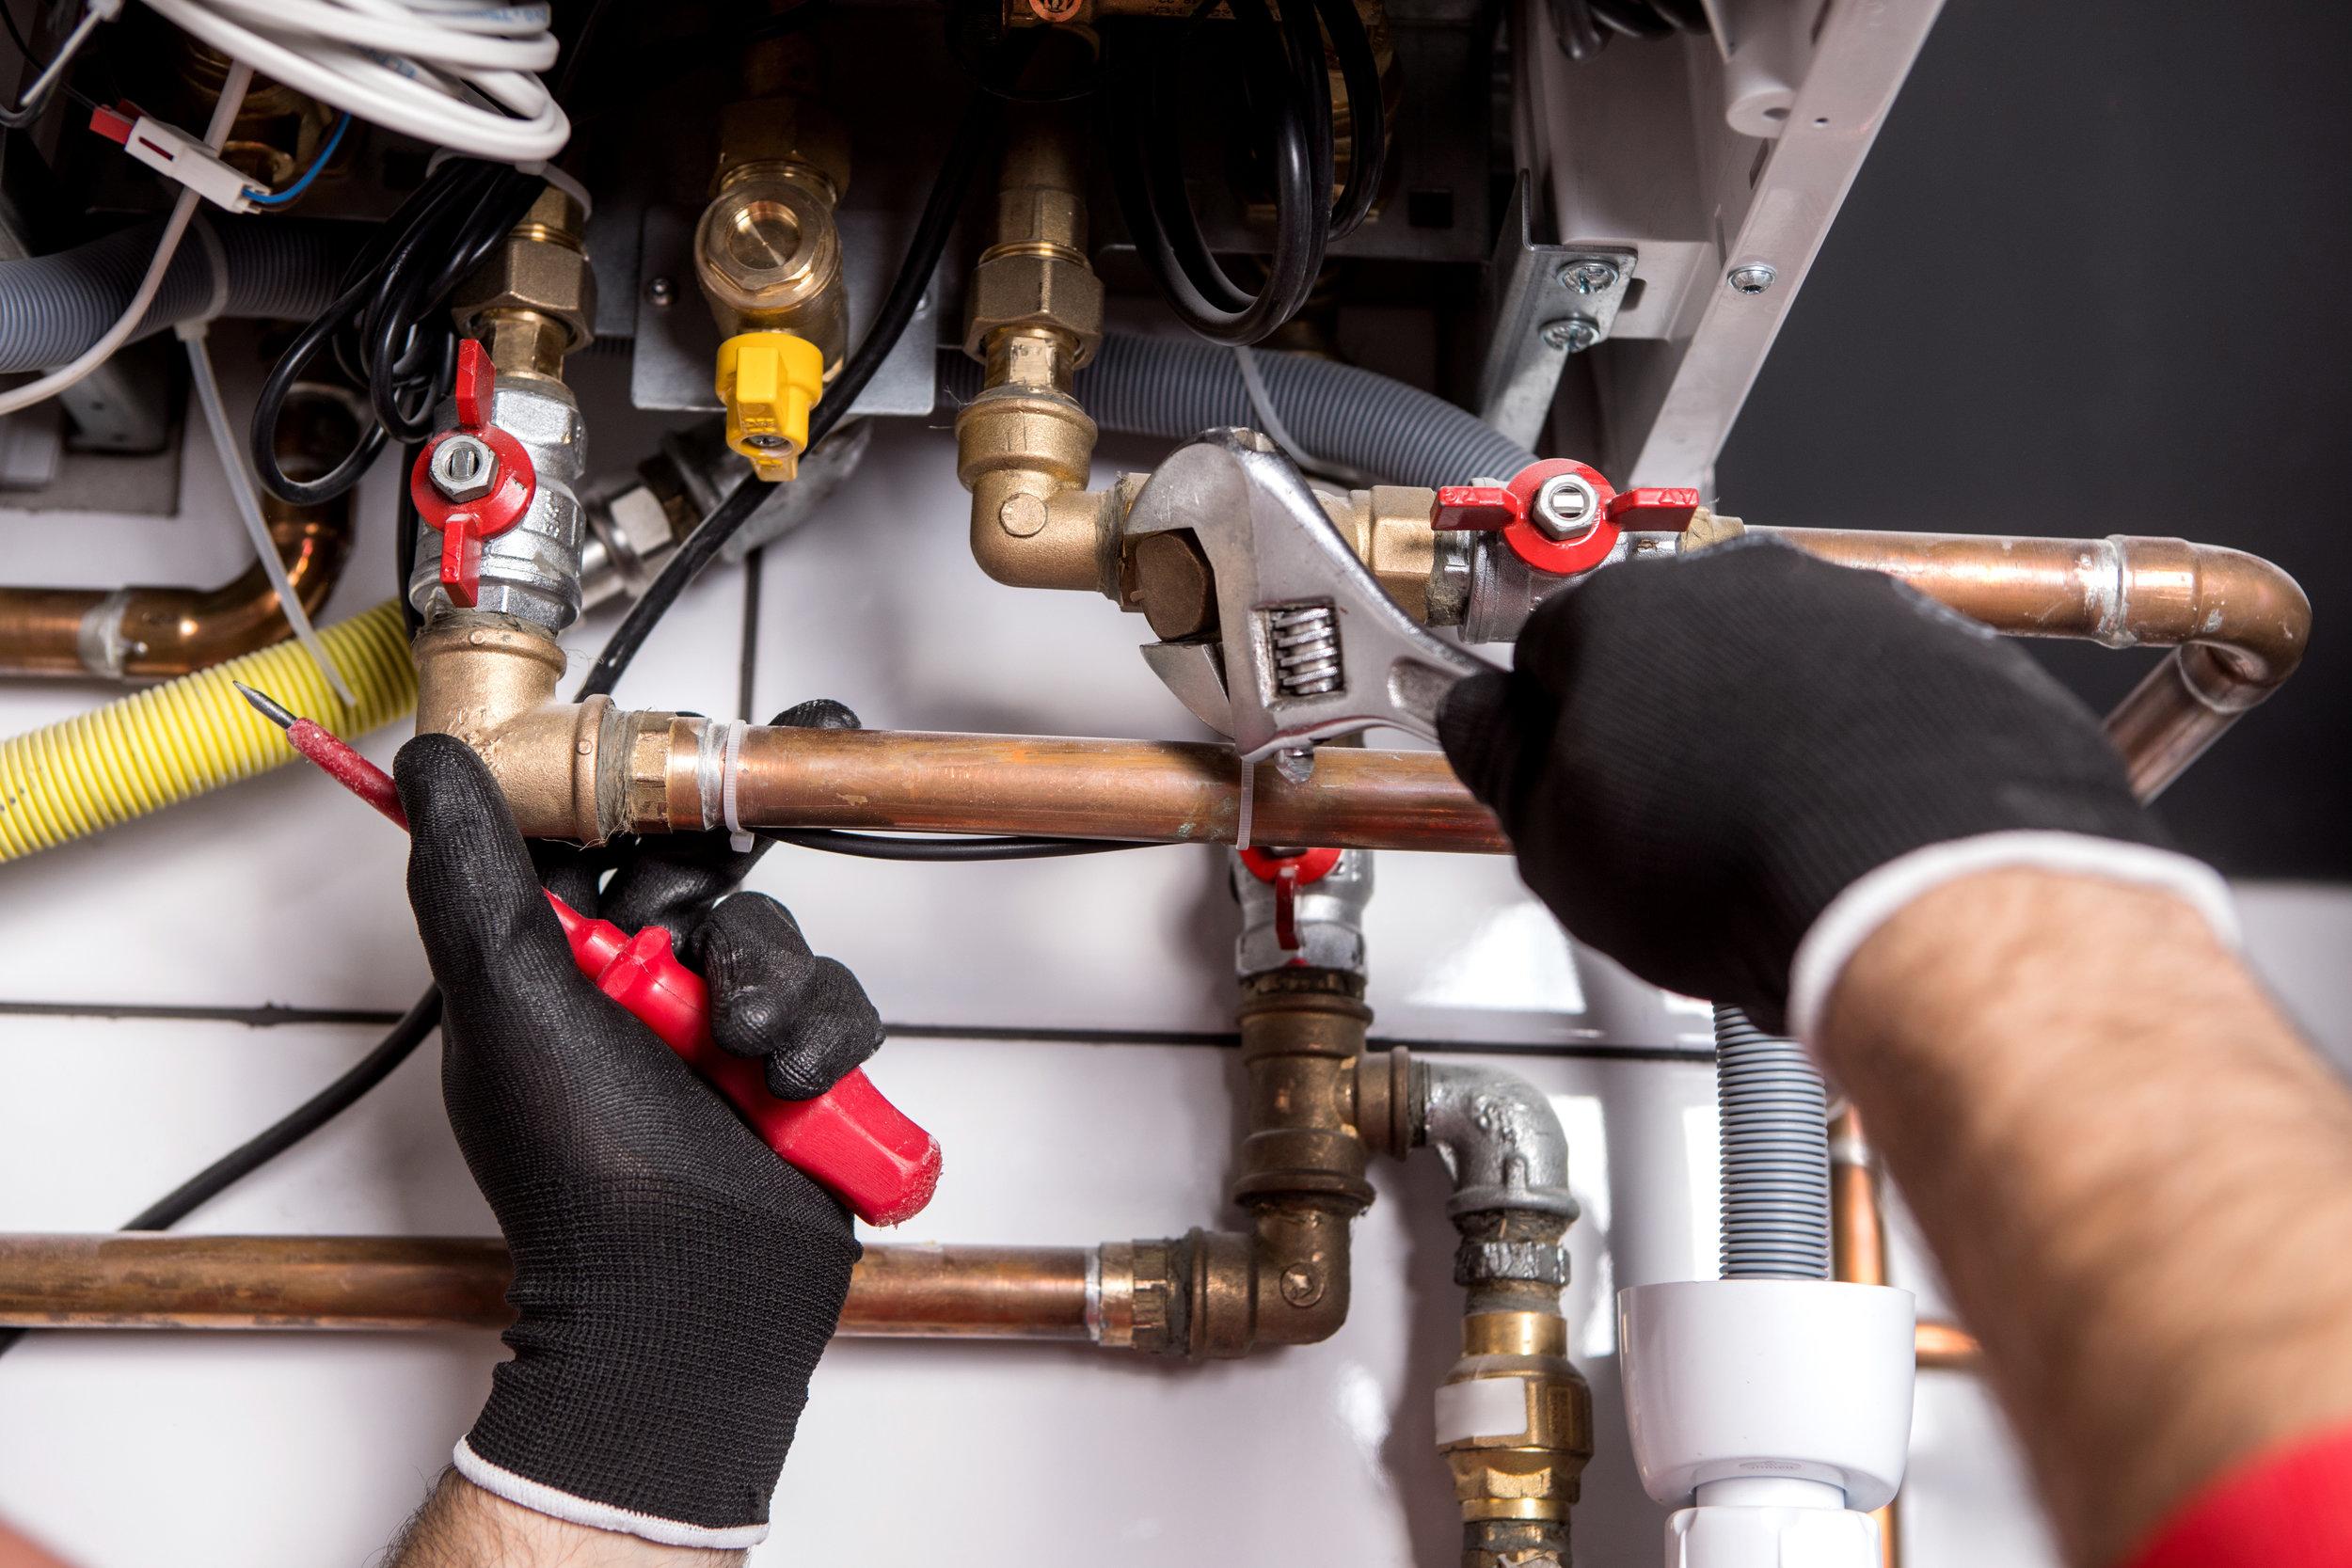 PLUMBING SERVICES - • Water Heater Repair & Installation• Drain Cleaning & Repair• Plumbing Remodeling• Plumbing Fixture Repair & Replacement• Plumbing Code Violations• Leak Detection & Repair• Sewer Services & Repair• Sump & Well Pumps• Water Treatment• Light Commercial Plumbing